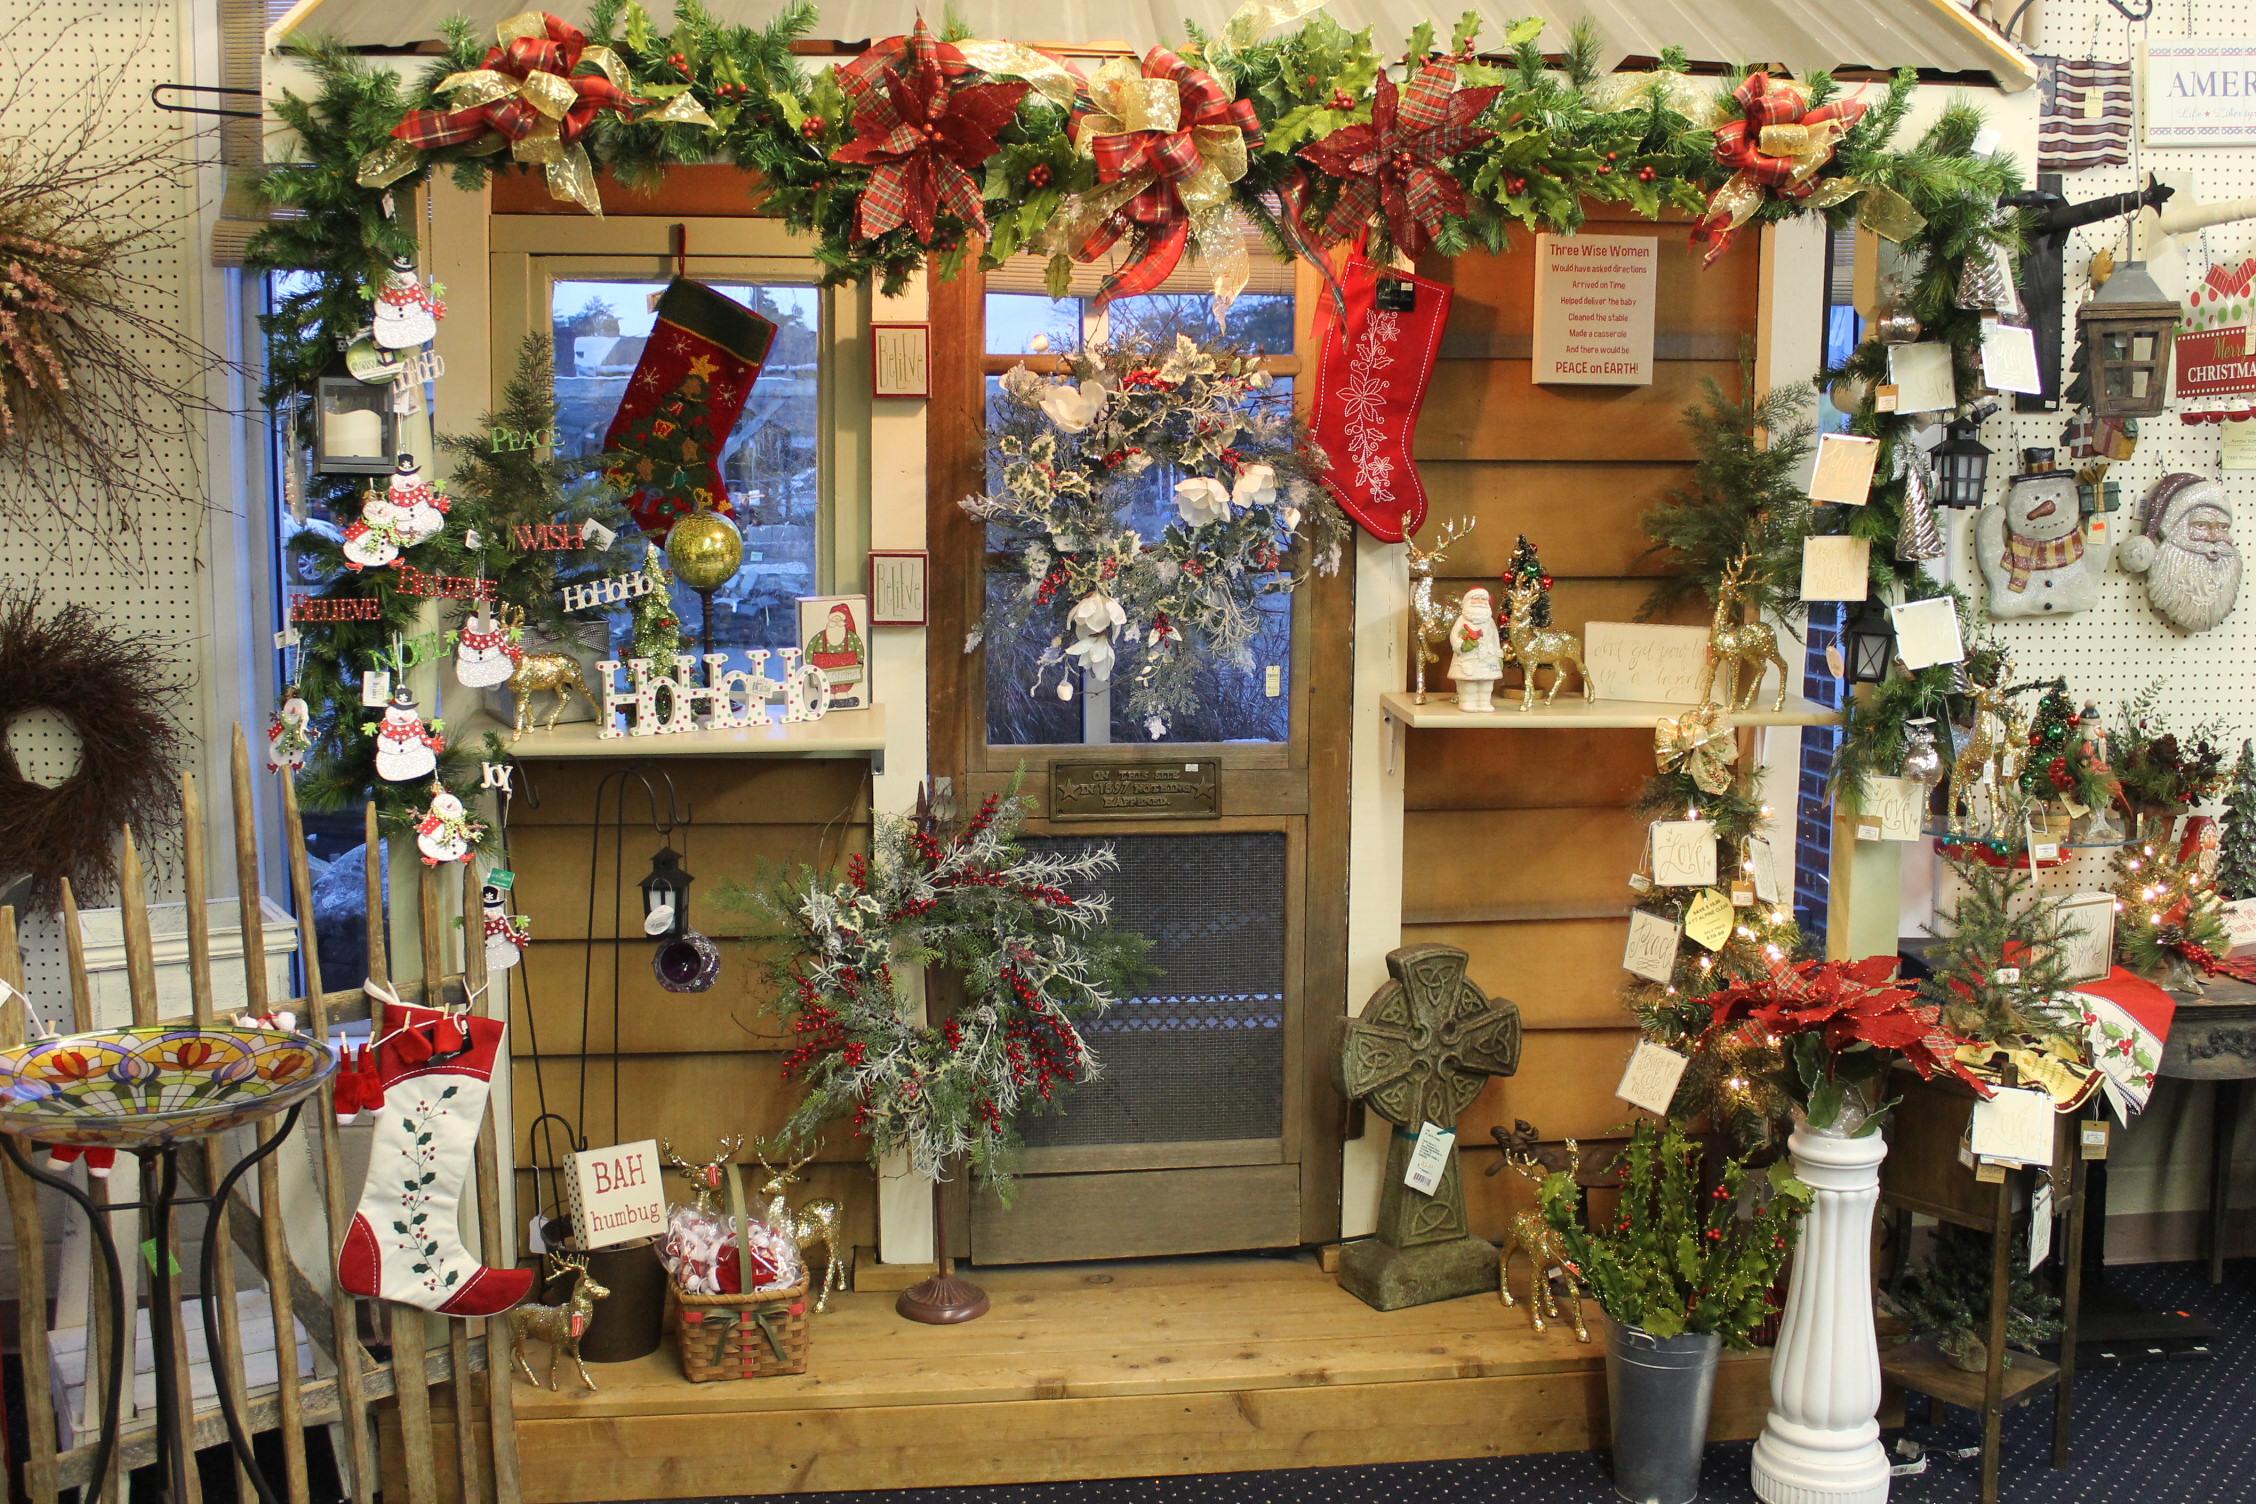 Christmas - Haines Farm and Garden SupplyHaines Farm and Garden Supply